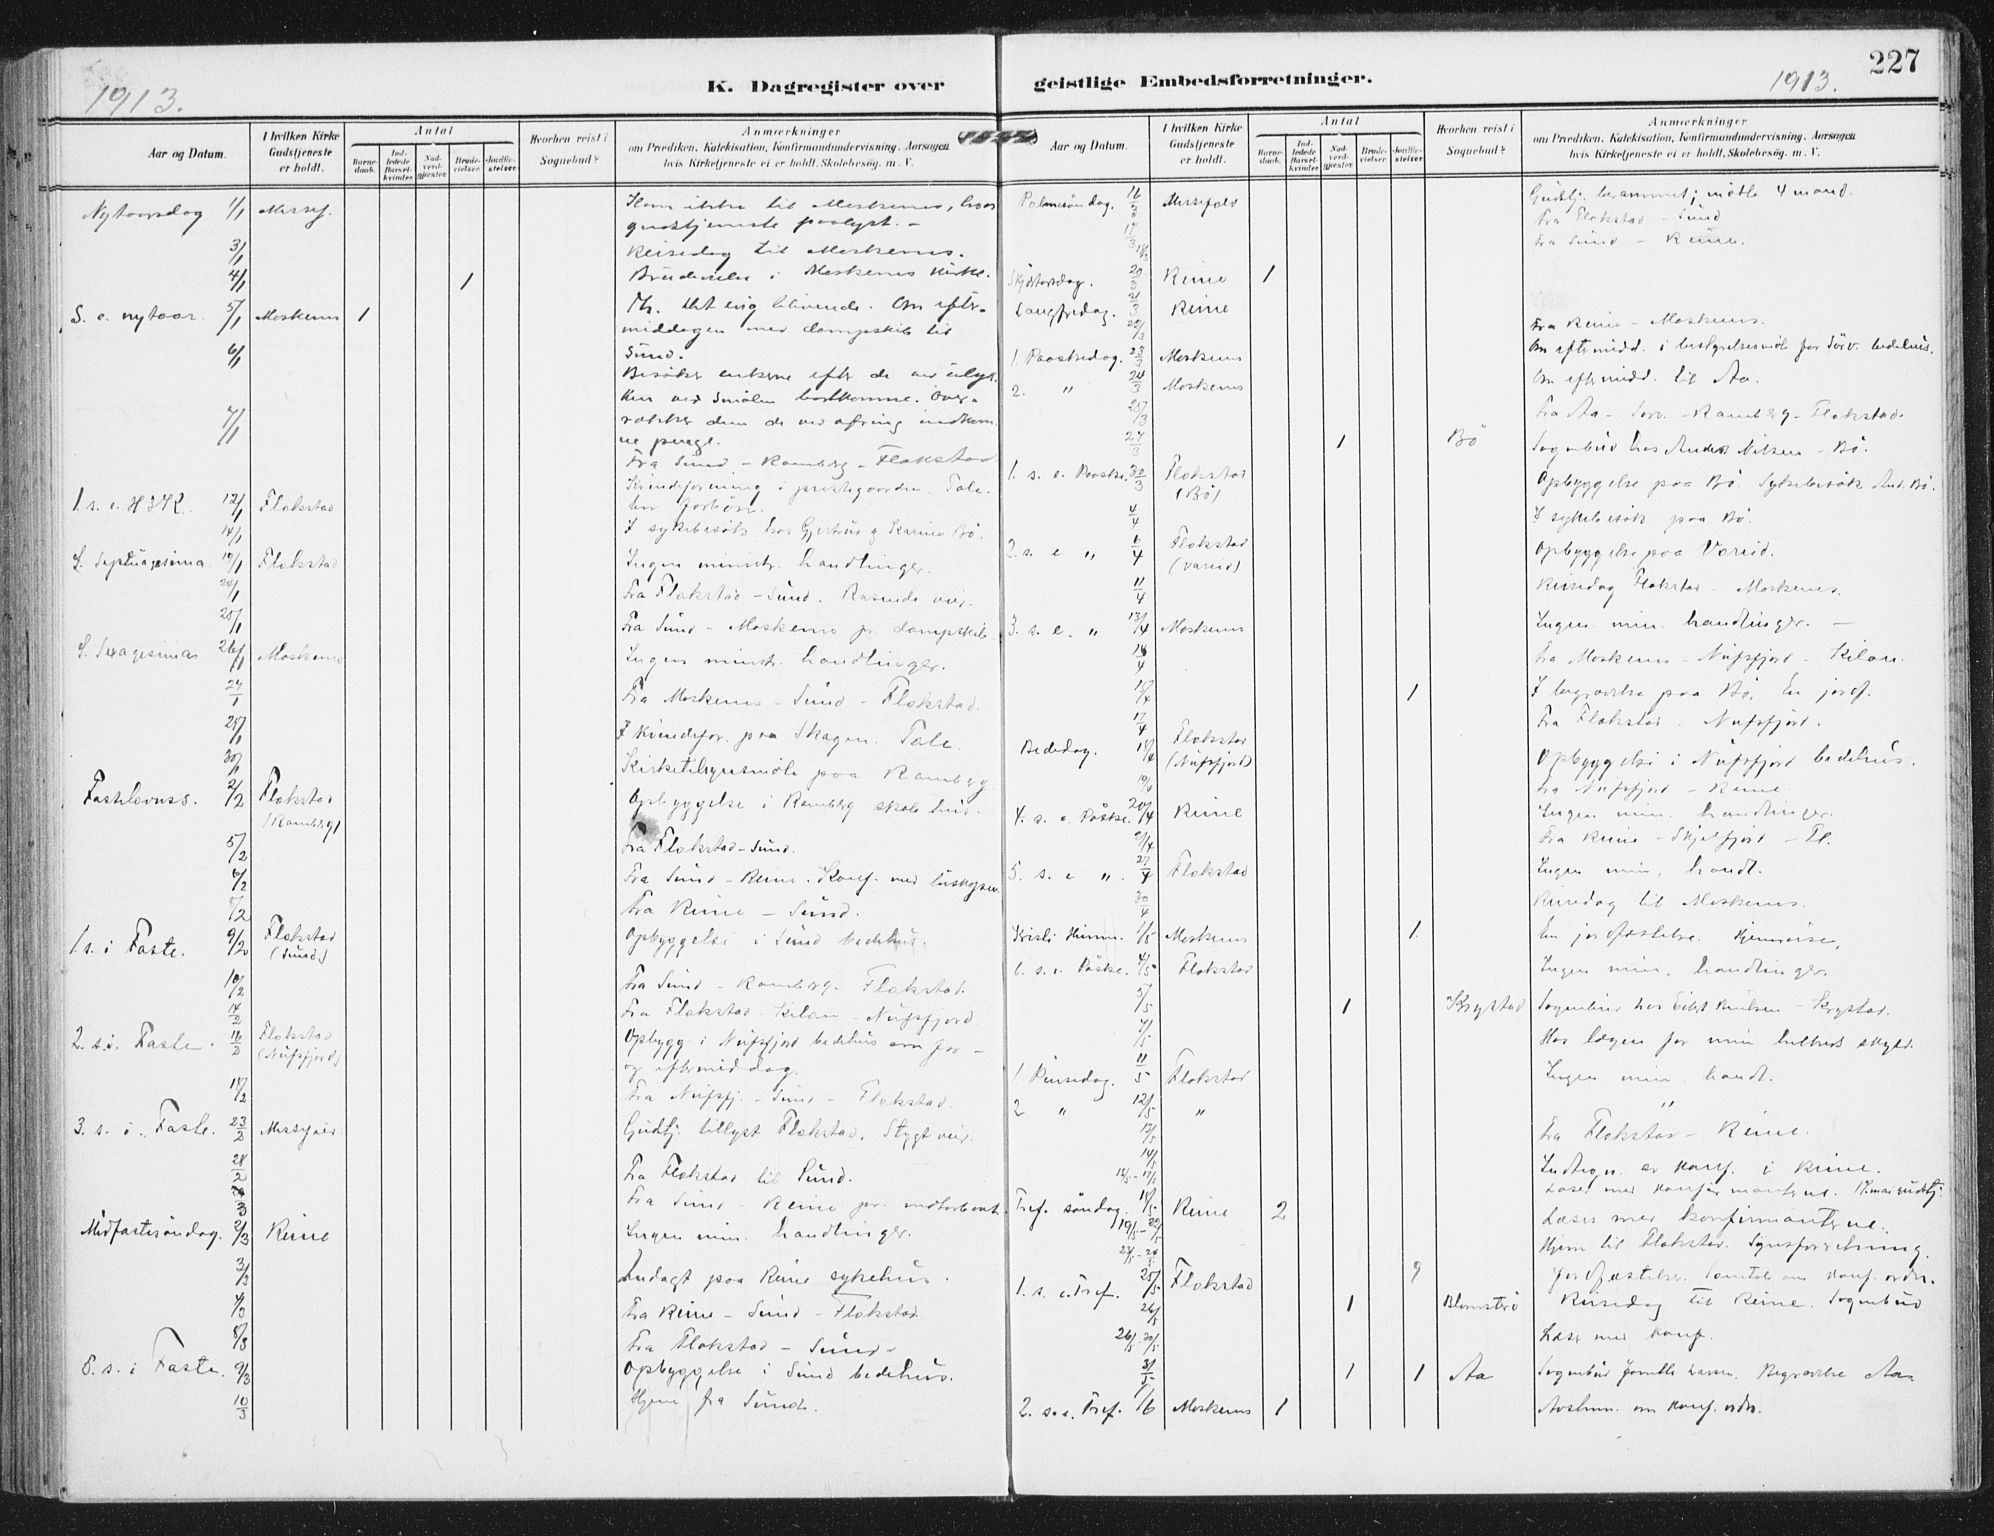 SAT, Ministerialprotokoller, klokkerbøker og fødselsregistre - Nordland, 885/L1206: Ministerialbok nr. 885A07, 1905-1915, s. 227